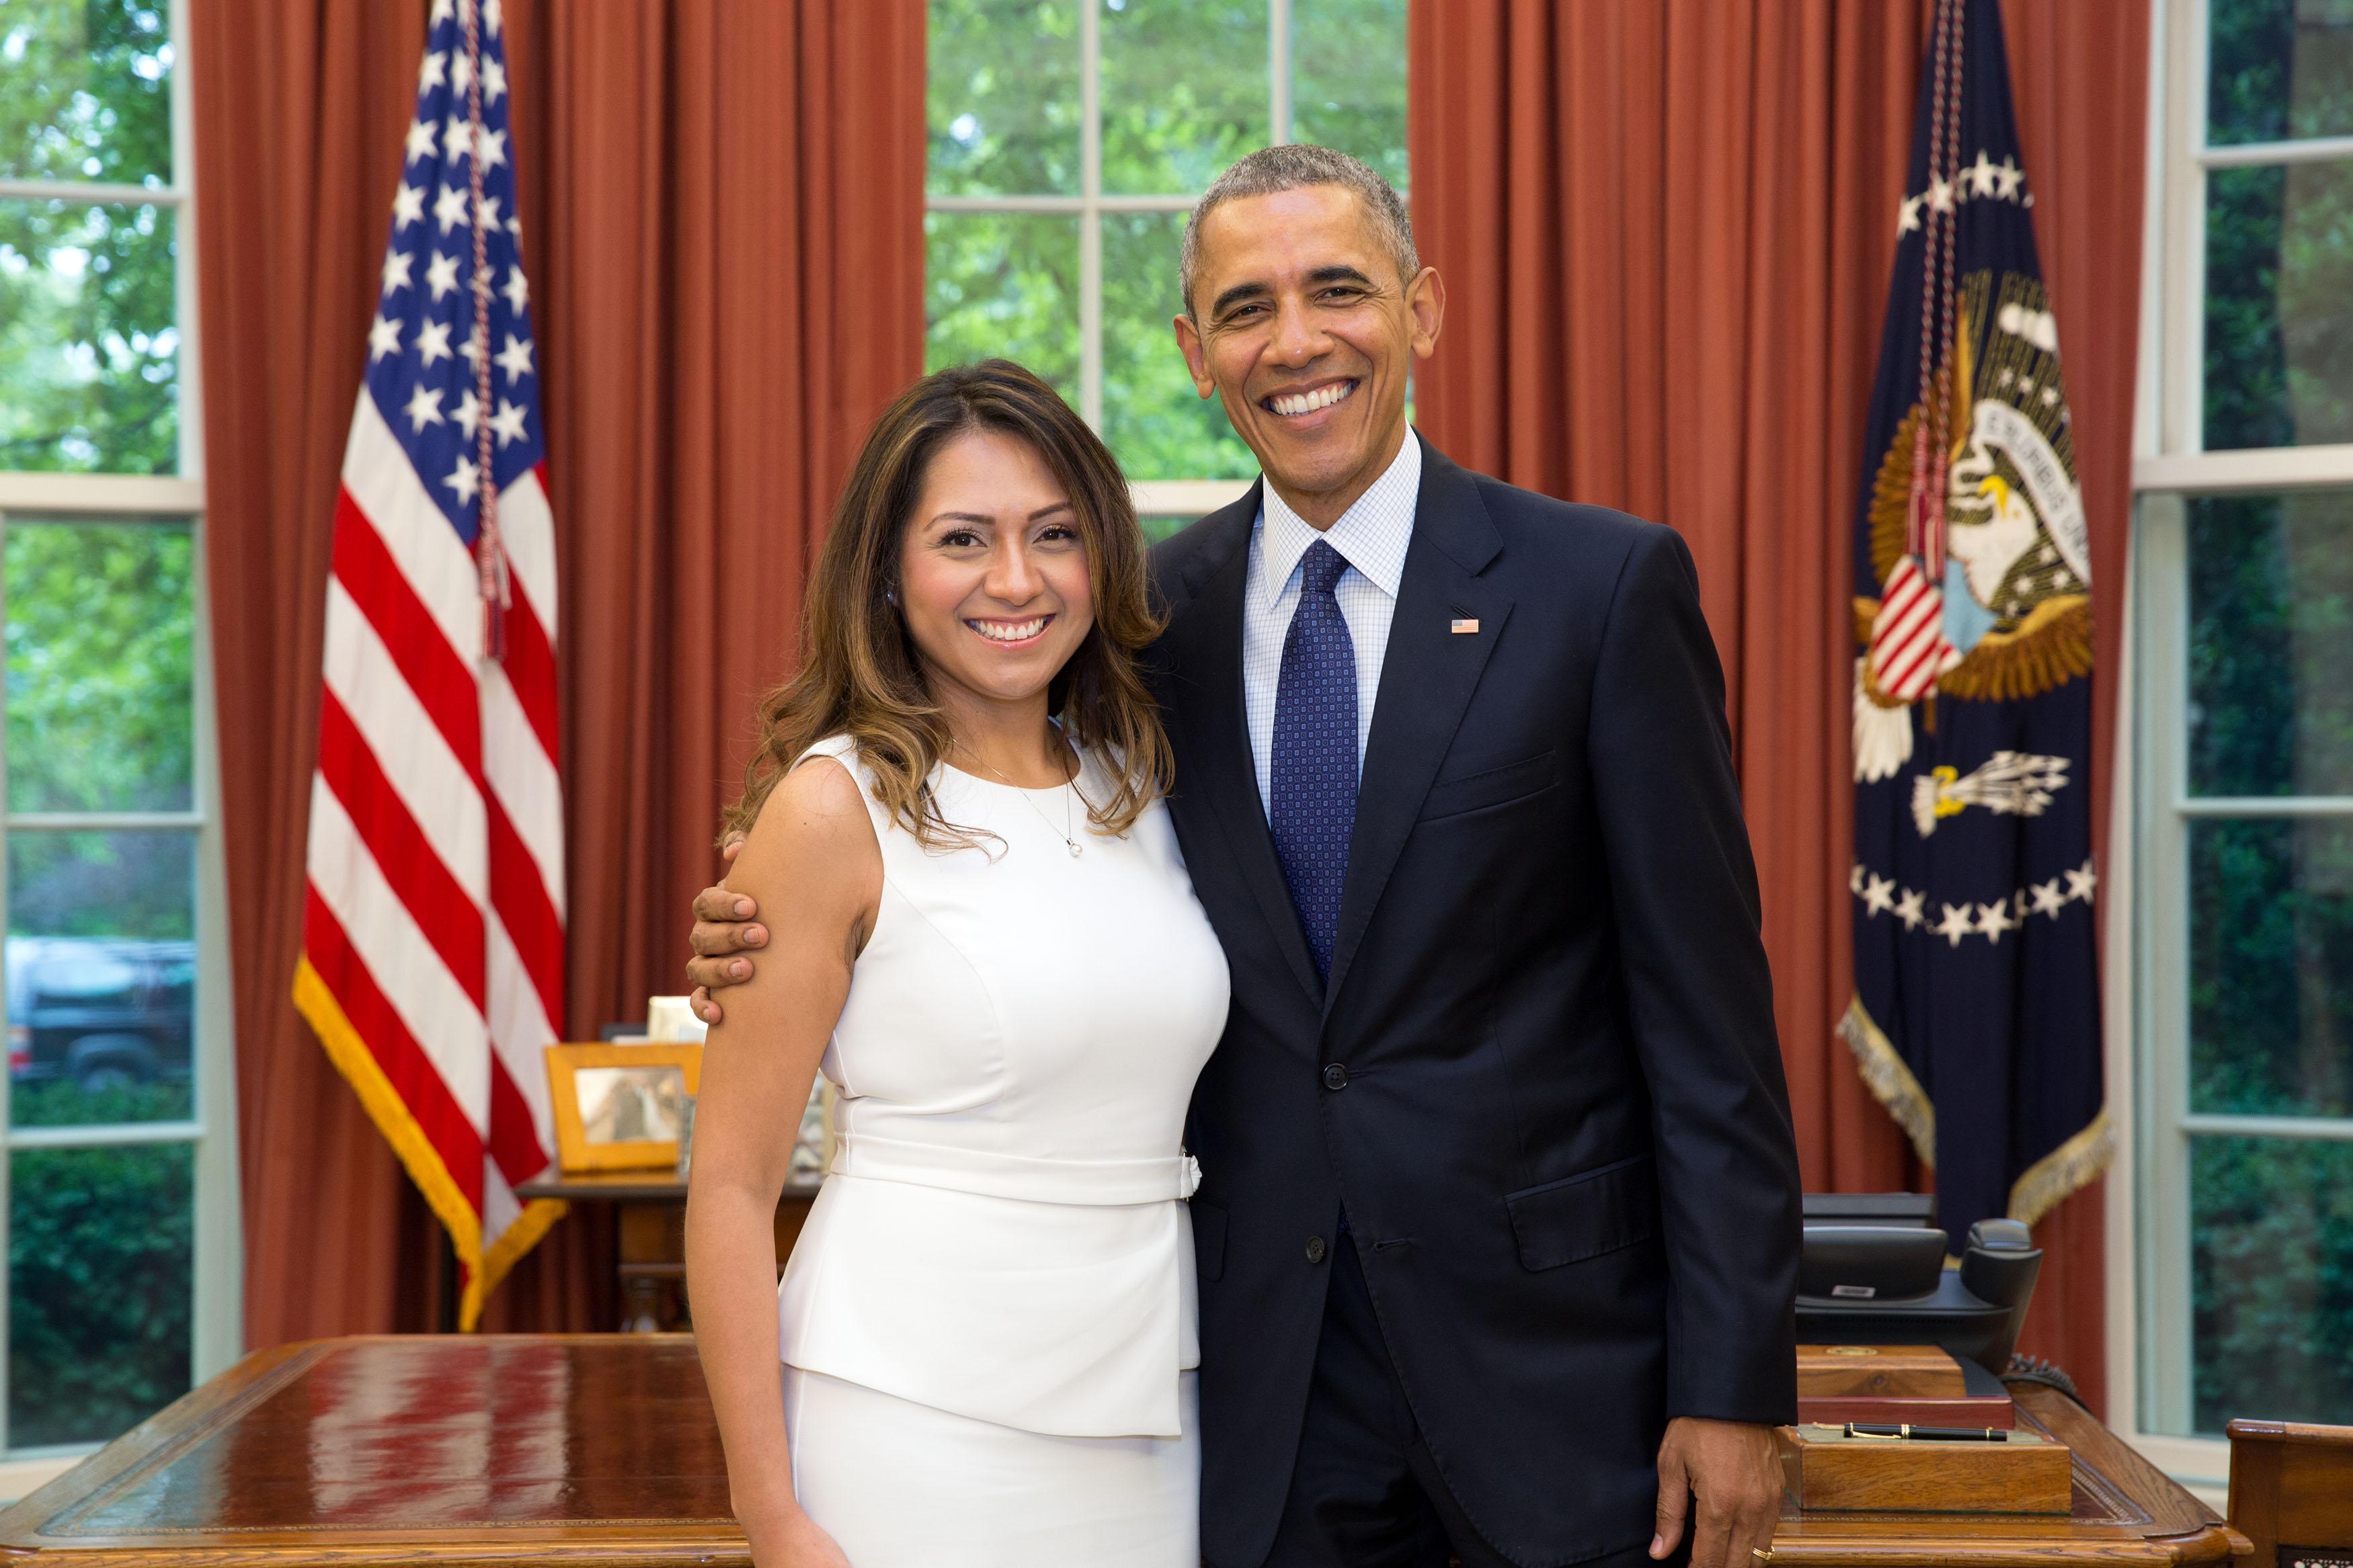 Andrea Ambriz with President Barack Obama